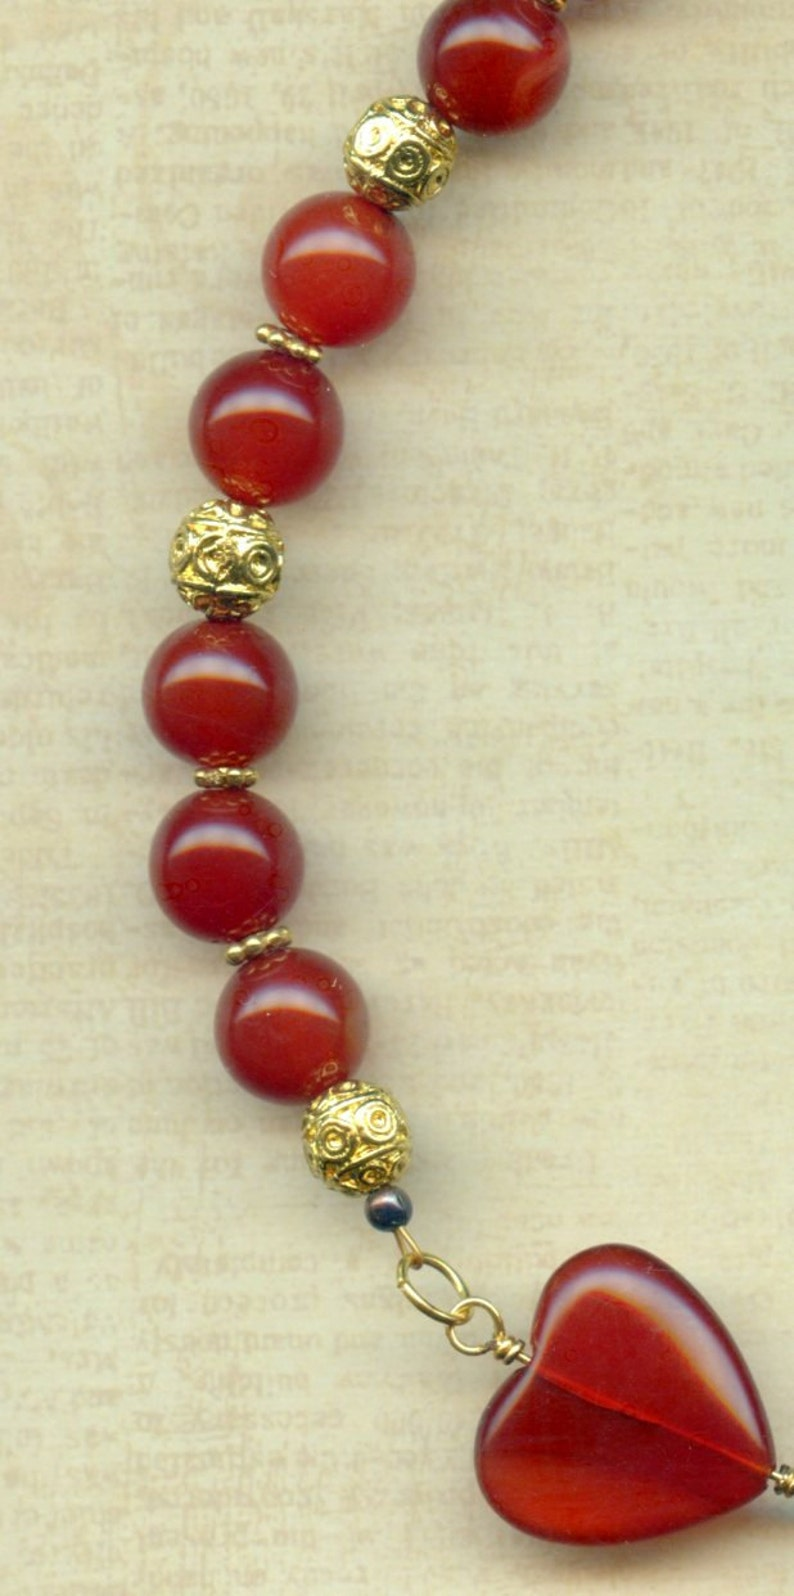 Carnelian Hearts Necklace